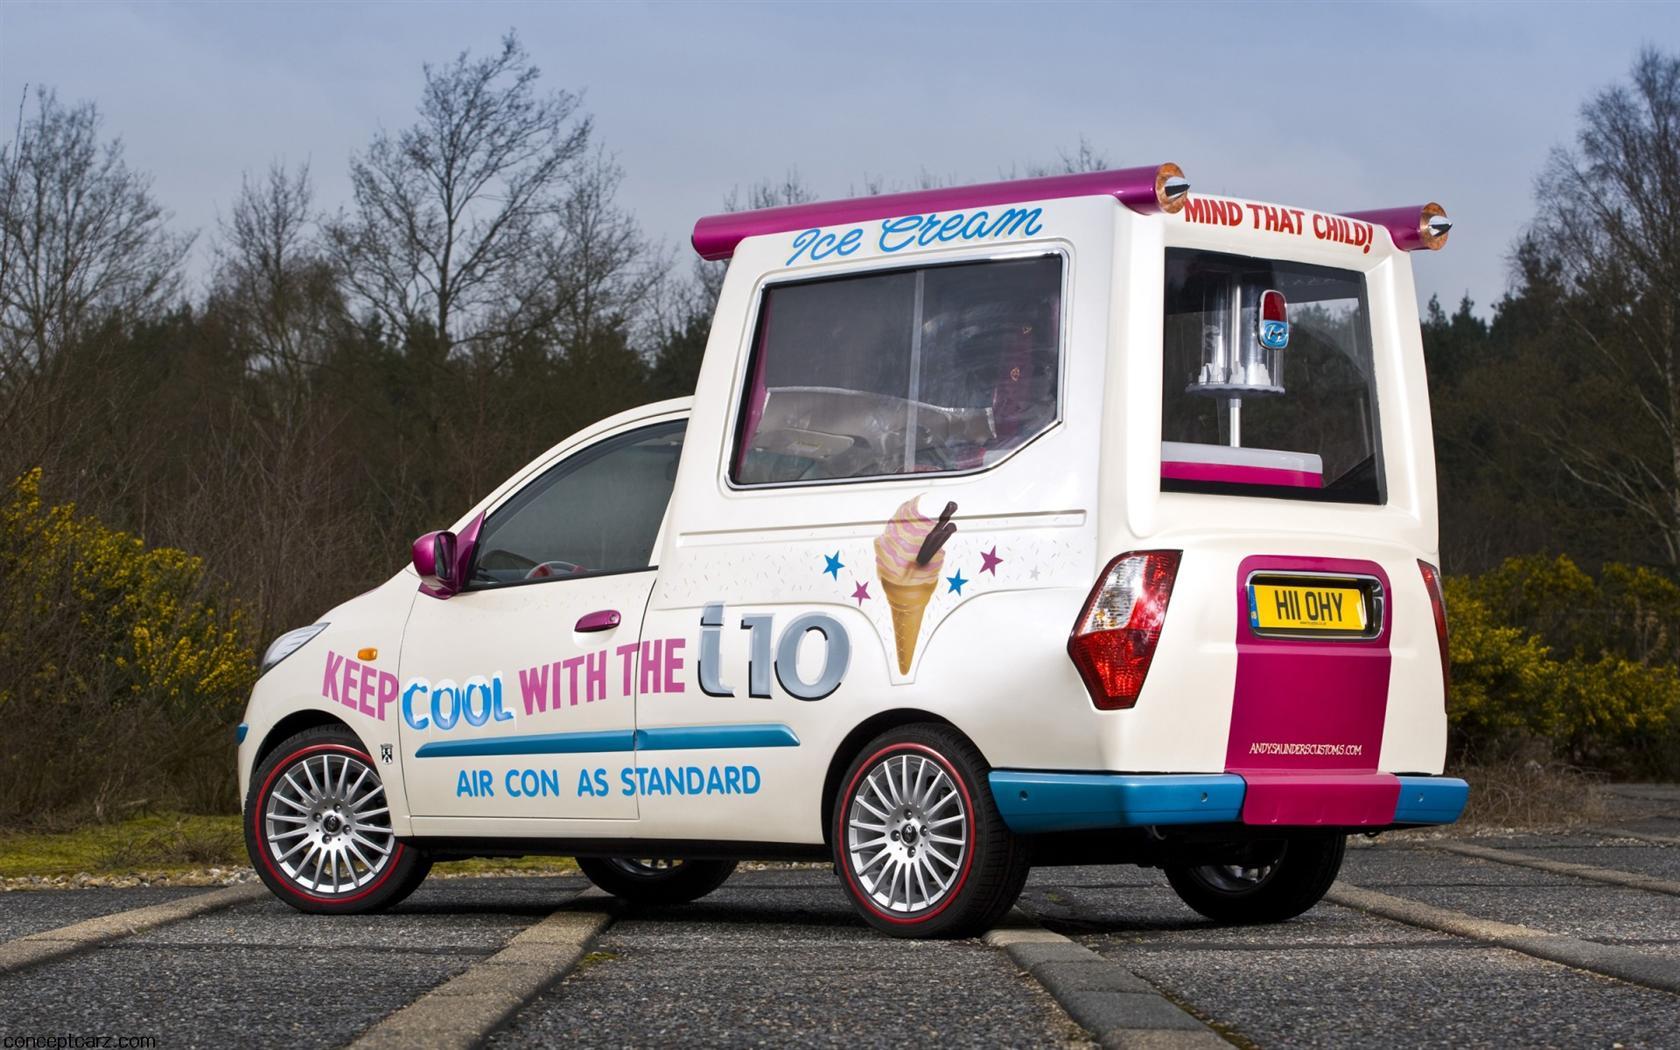 2011 Hyundai I10 Ice Cream Van Image Https Www Conceptcarz Com Images Hyundai Hyundai I10 Ice